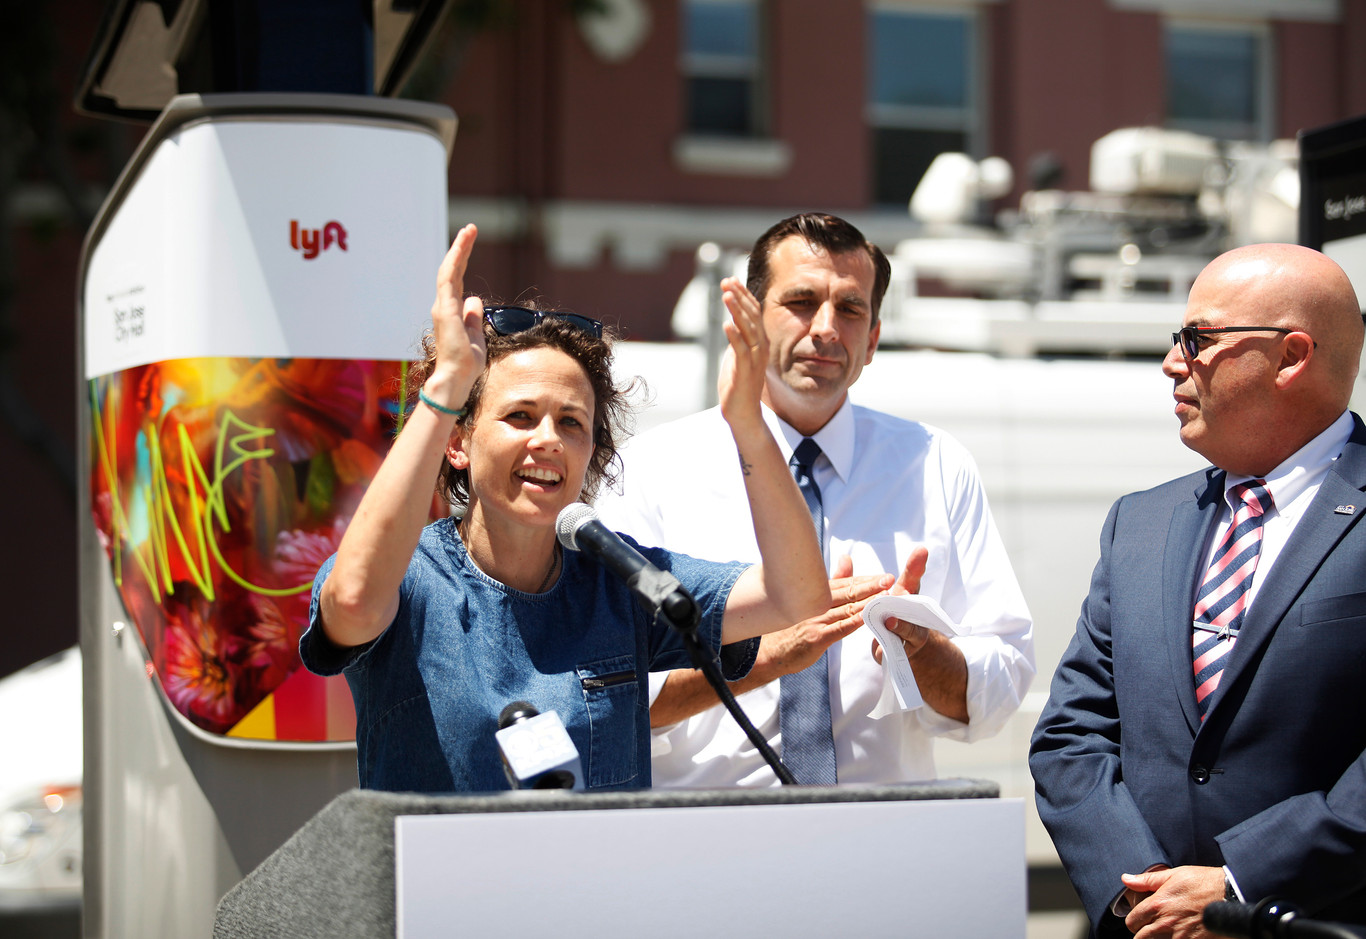 Caroline Samponaro, Lyft's head of micro mobility policy, and San Jose Mayor Sam Liccardo celebrate the launching of affordable eBikes in San Jose (Ruth Abigail Gonzalez/Mosaic).